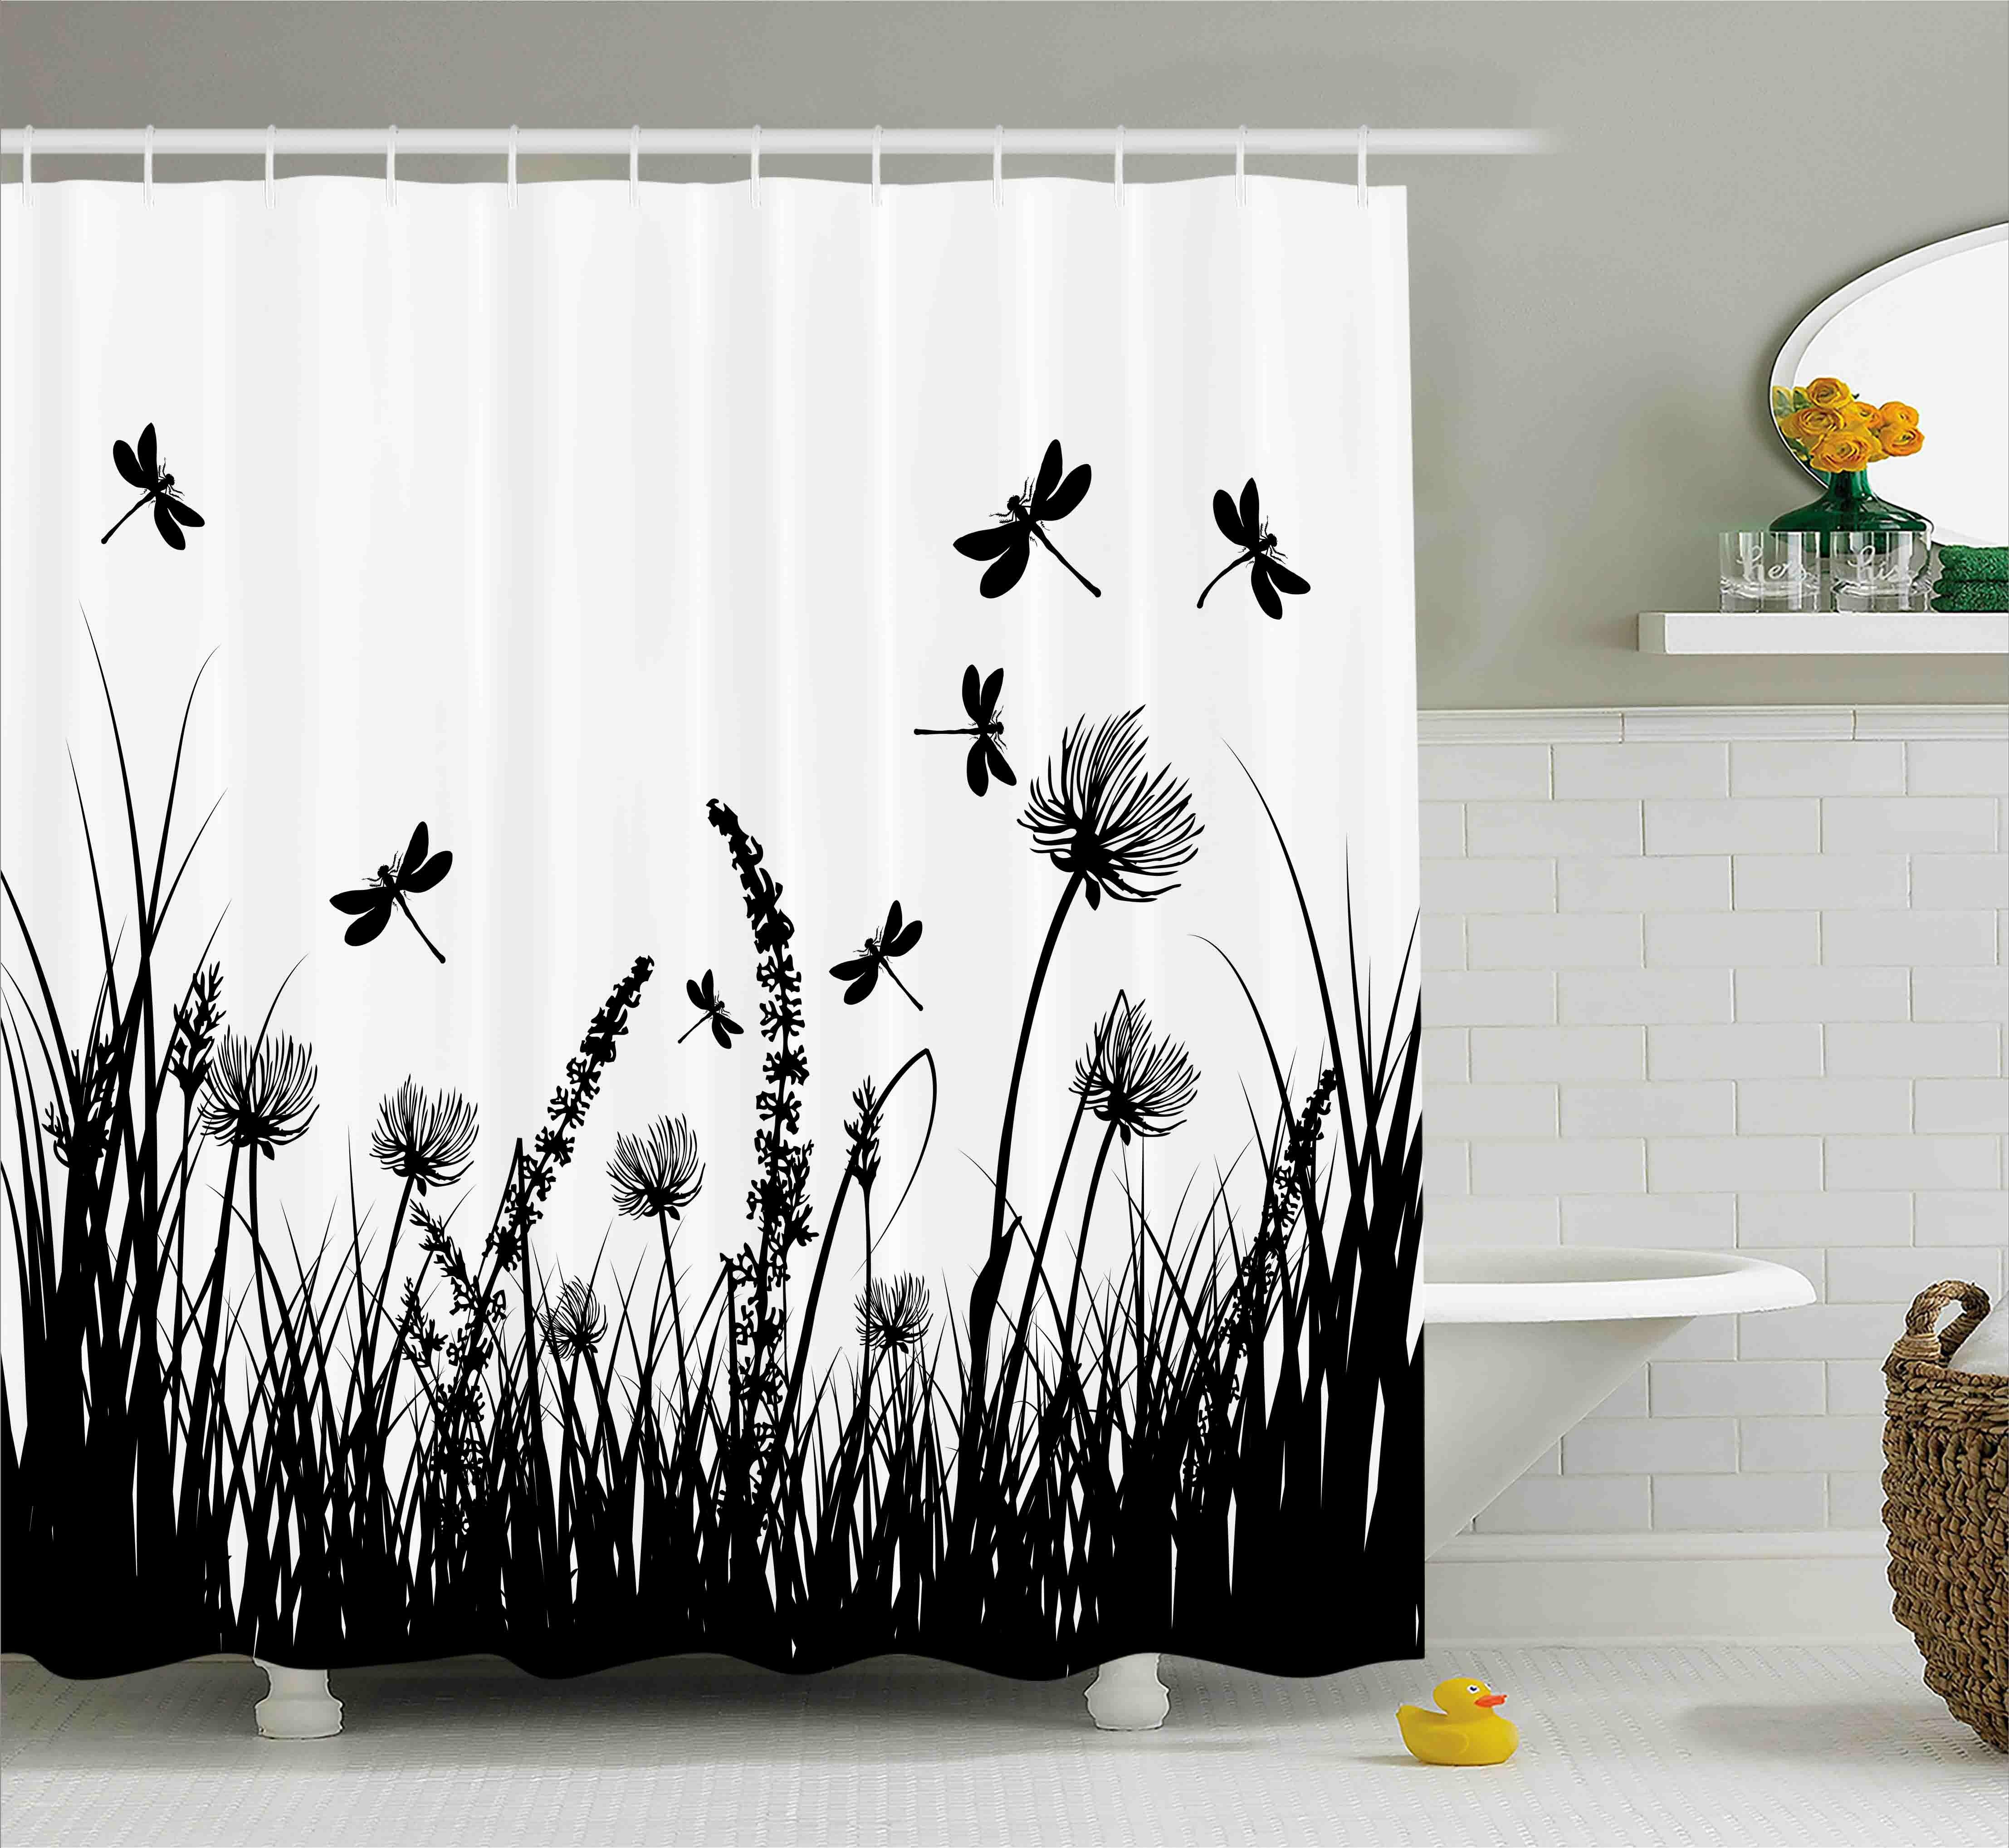 Ebern Designs Faya Grass Bush Meadow Spring Shower Curtain